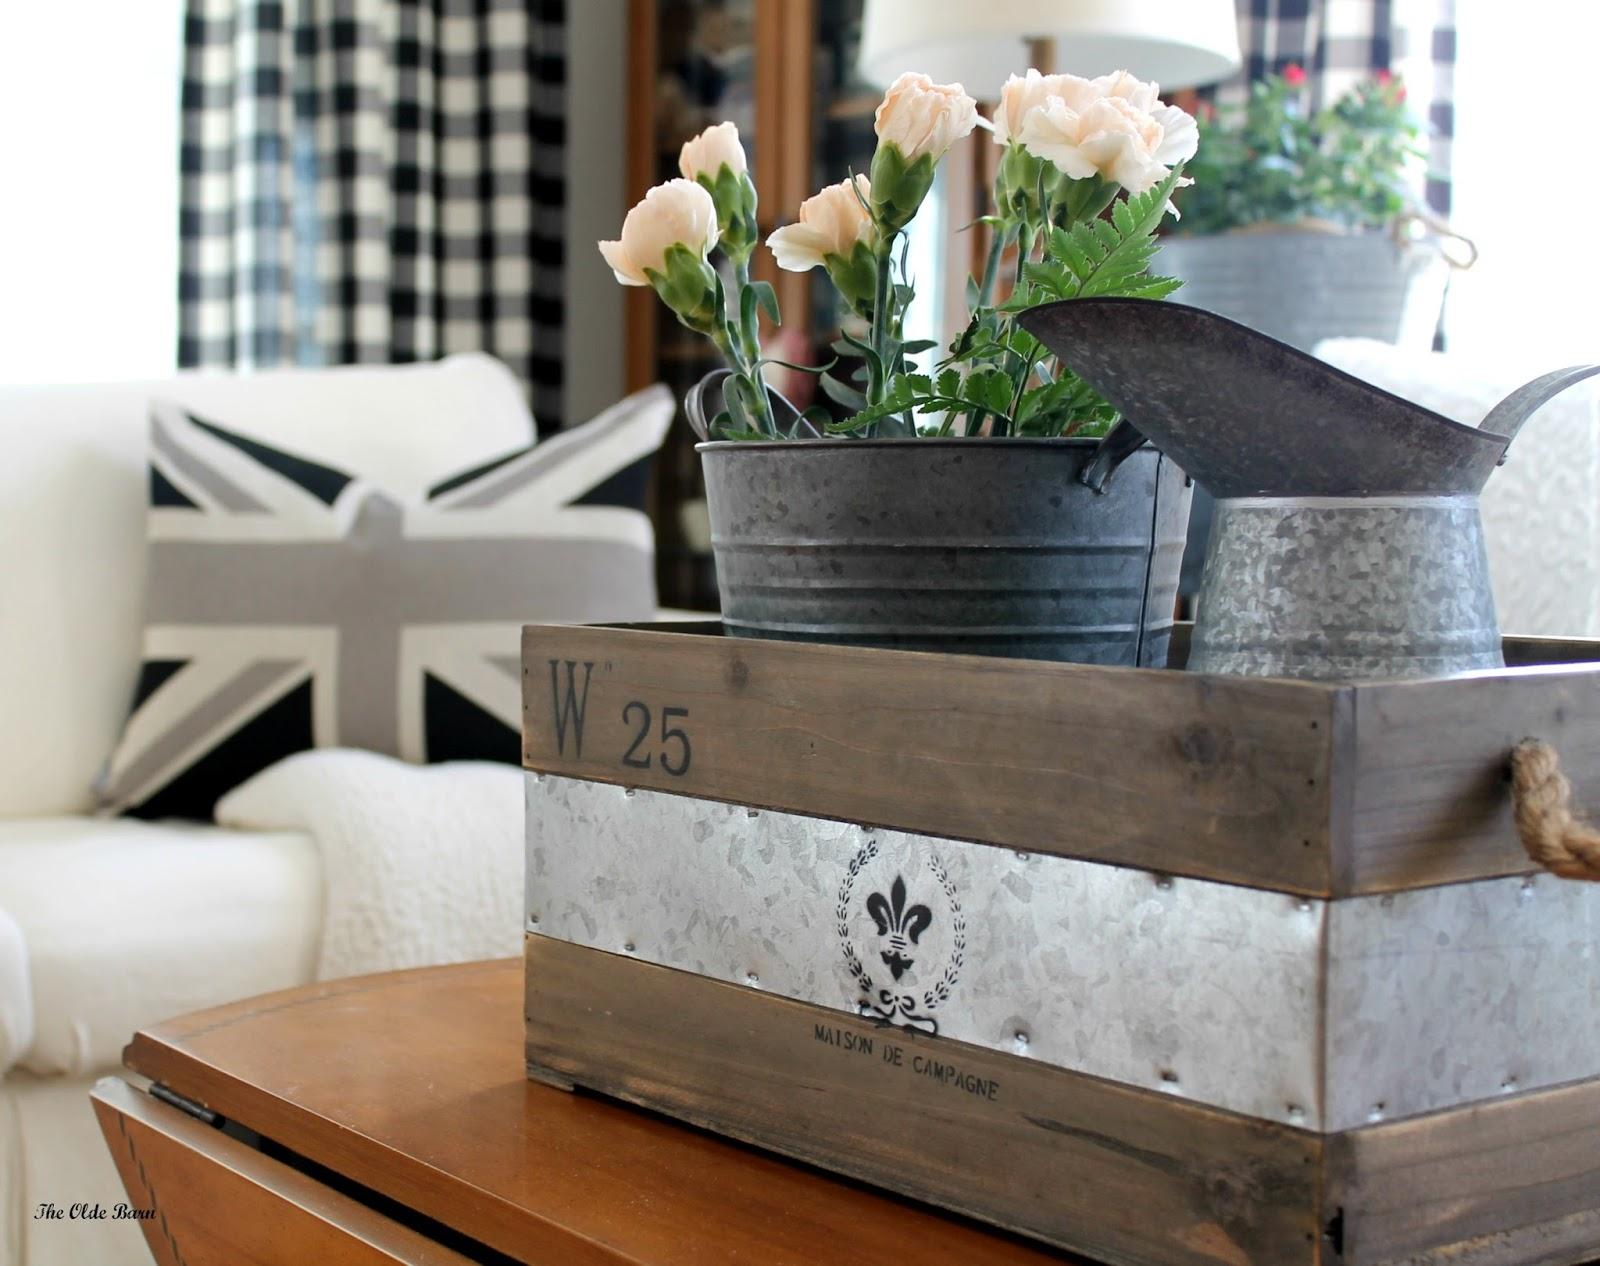 Flower vase kijiji - Floor Wicker Basket Homesense Tv Wall Unit Wicker Basket Homesense Tv Wall Unit Kijiji Curio Cabinet Ikea French Farmhouse Wooden Box Homesense